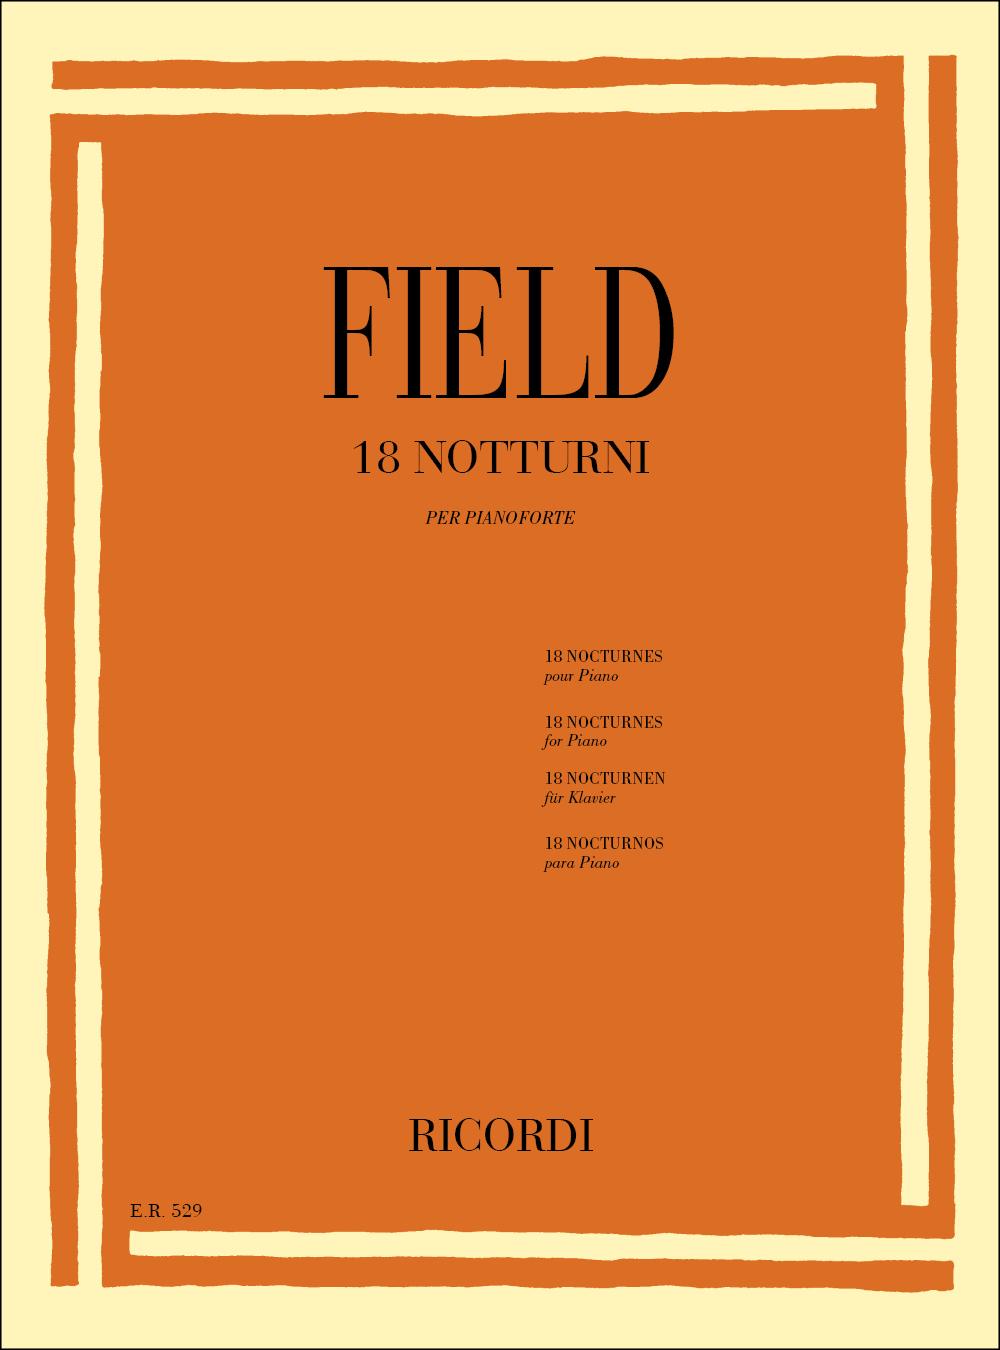 John Field: 18 Notturni: Piano